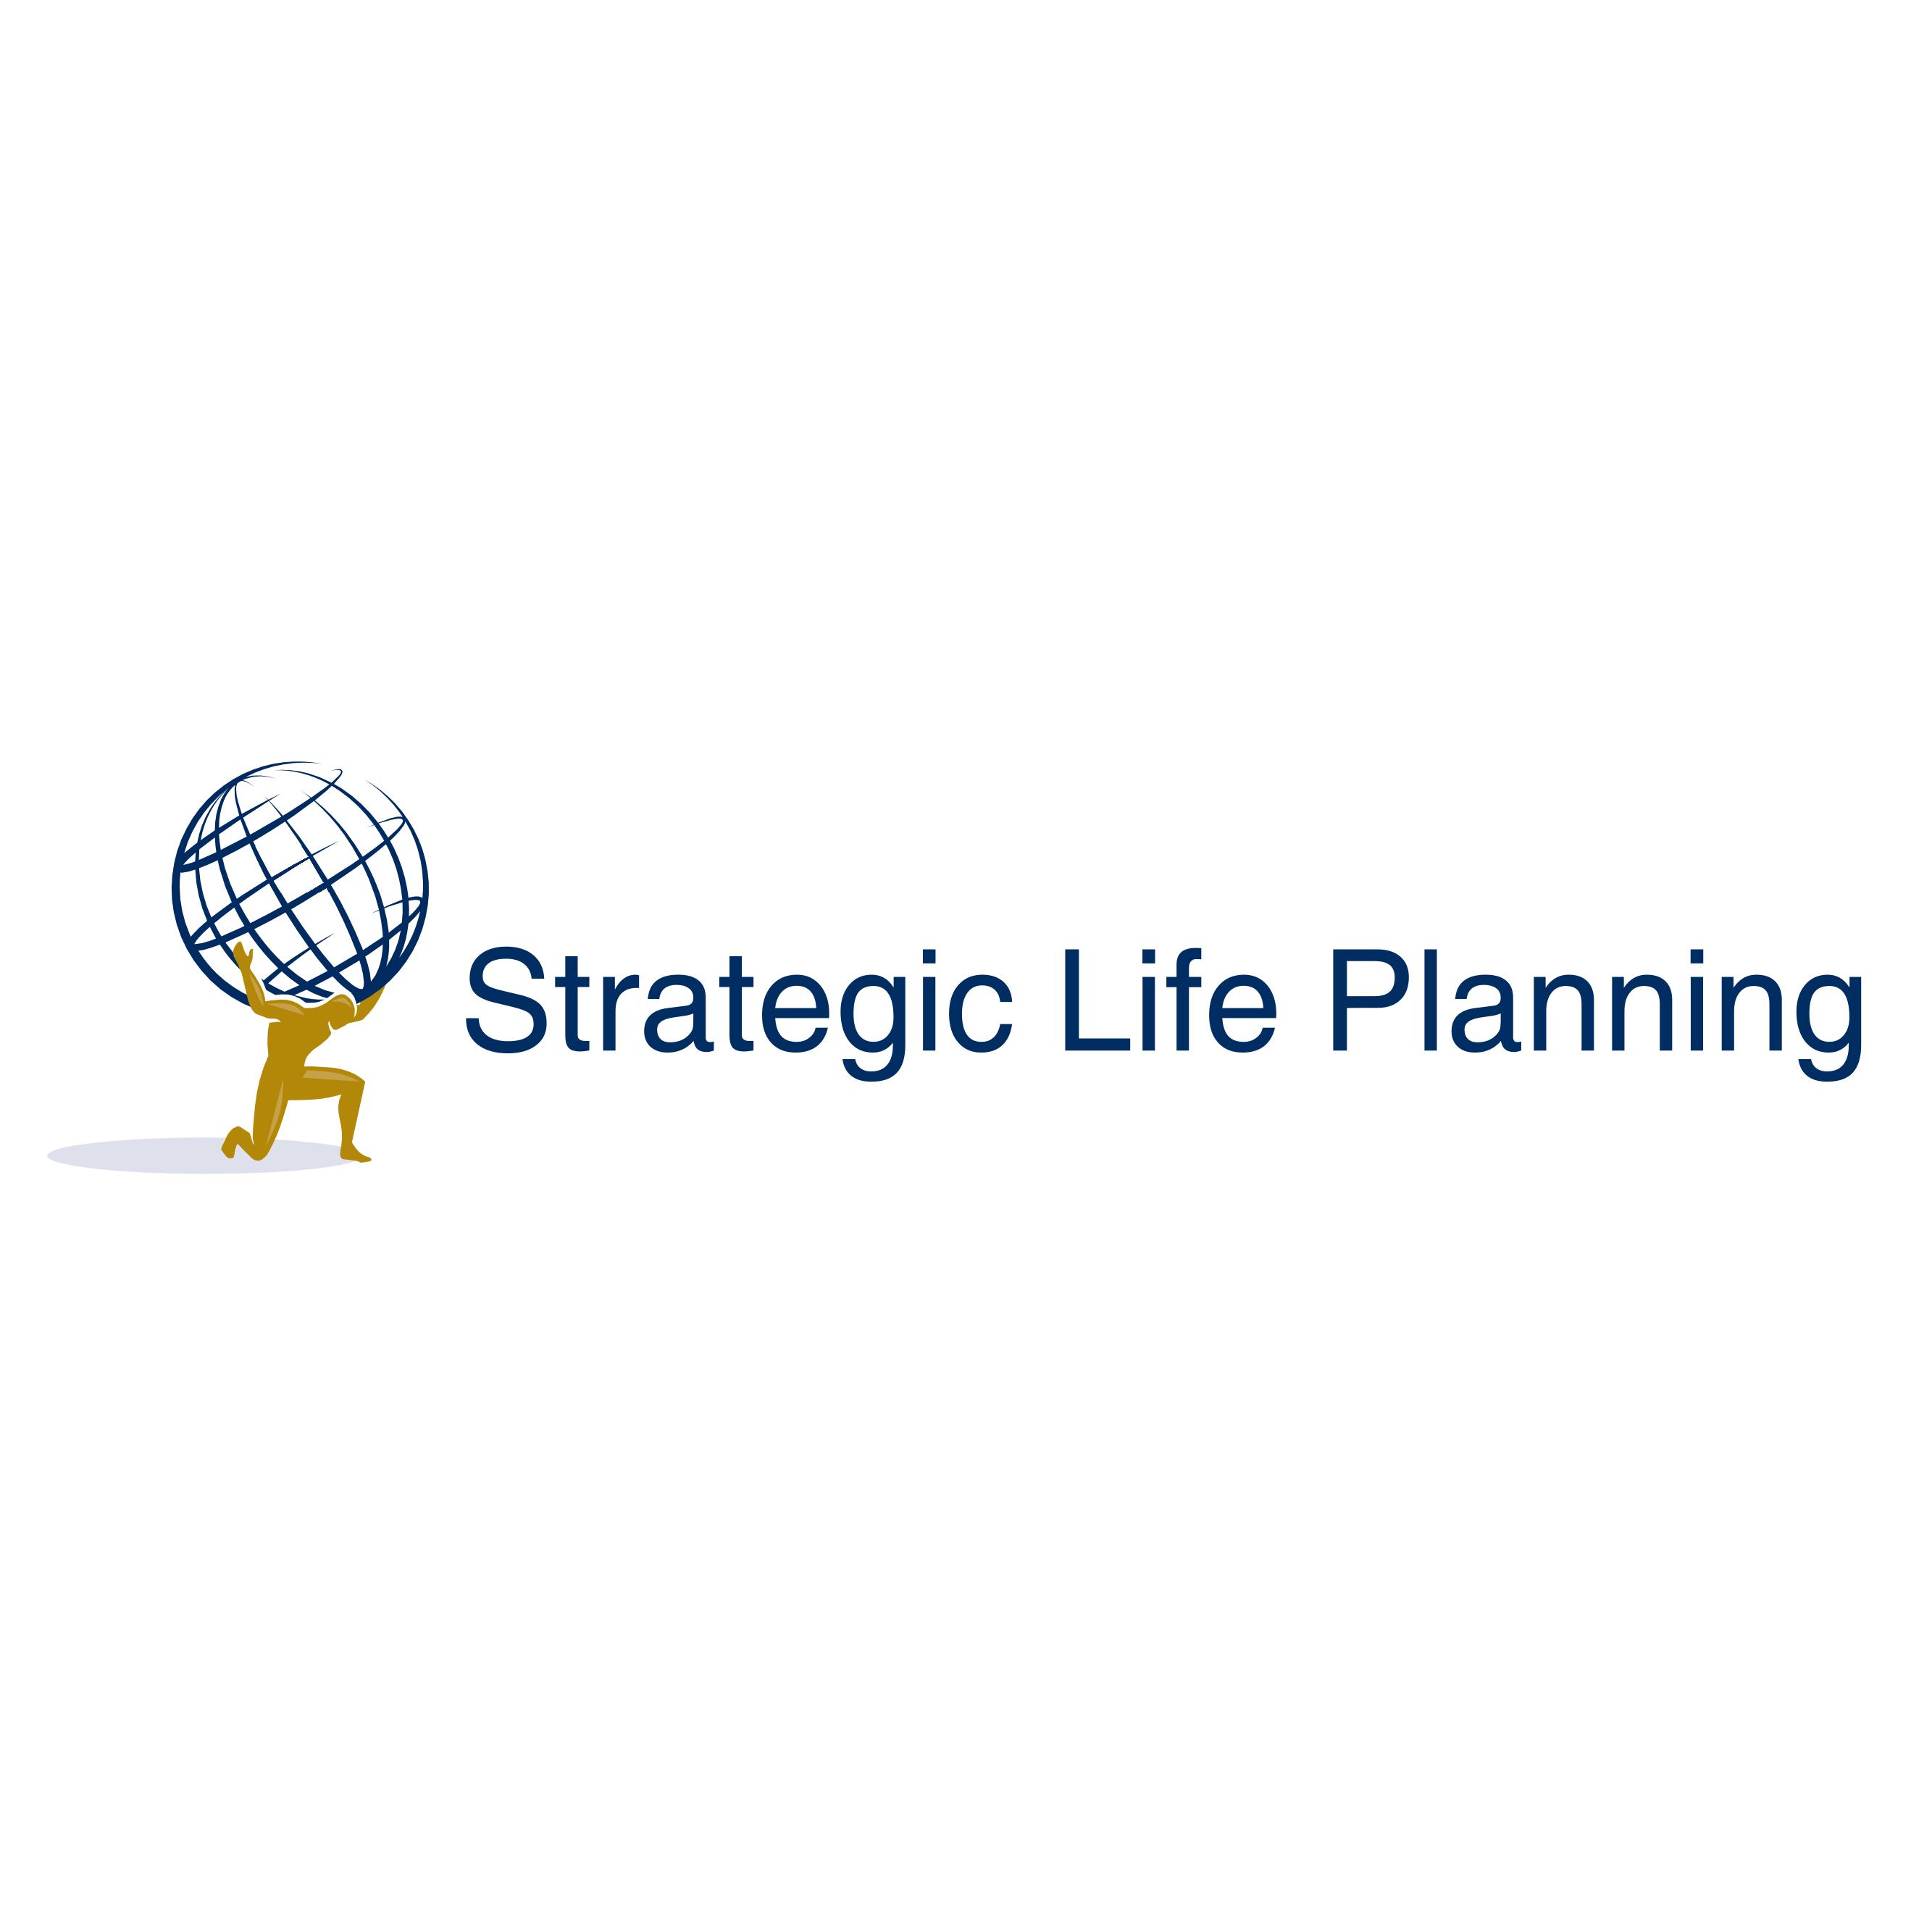 Strategic Life Planning